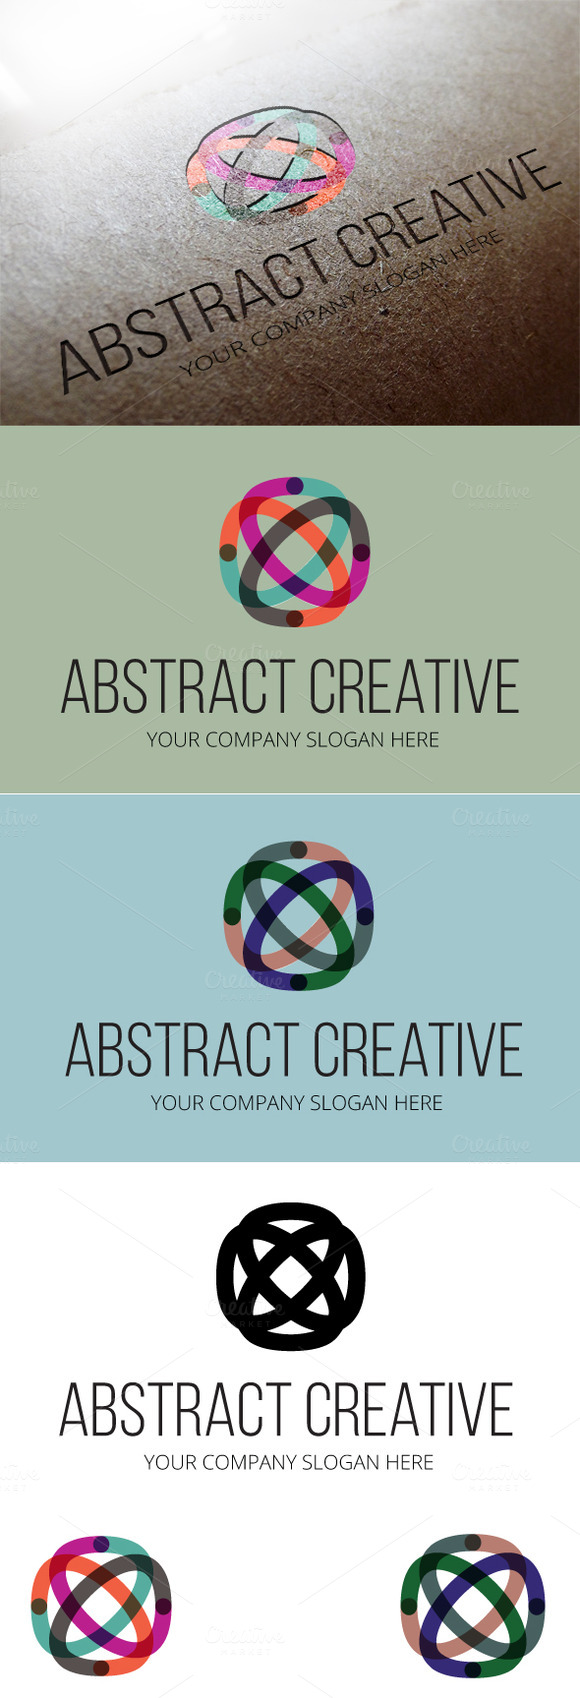 Abstract Creative Logo Template